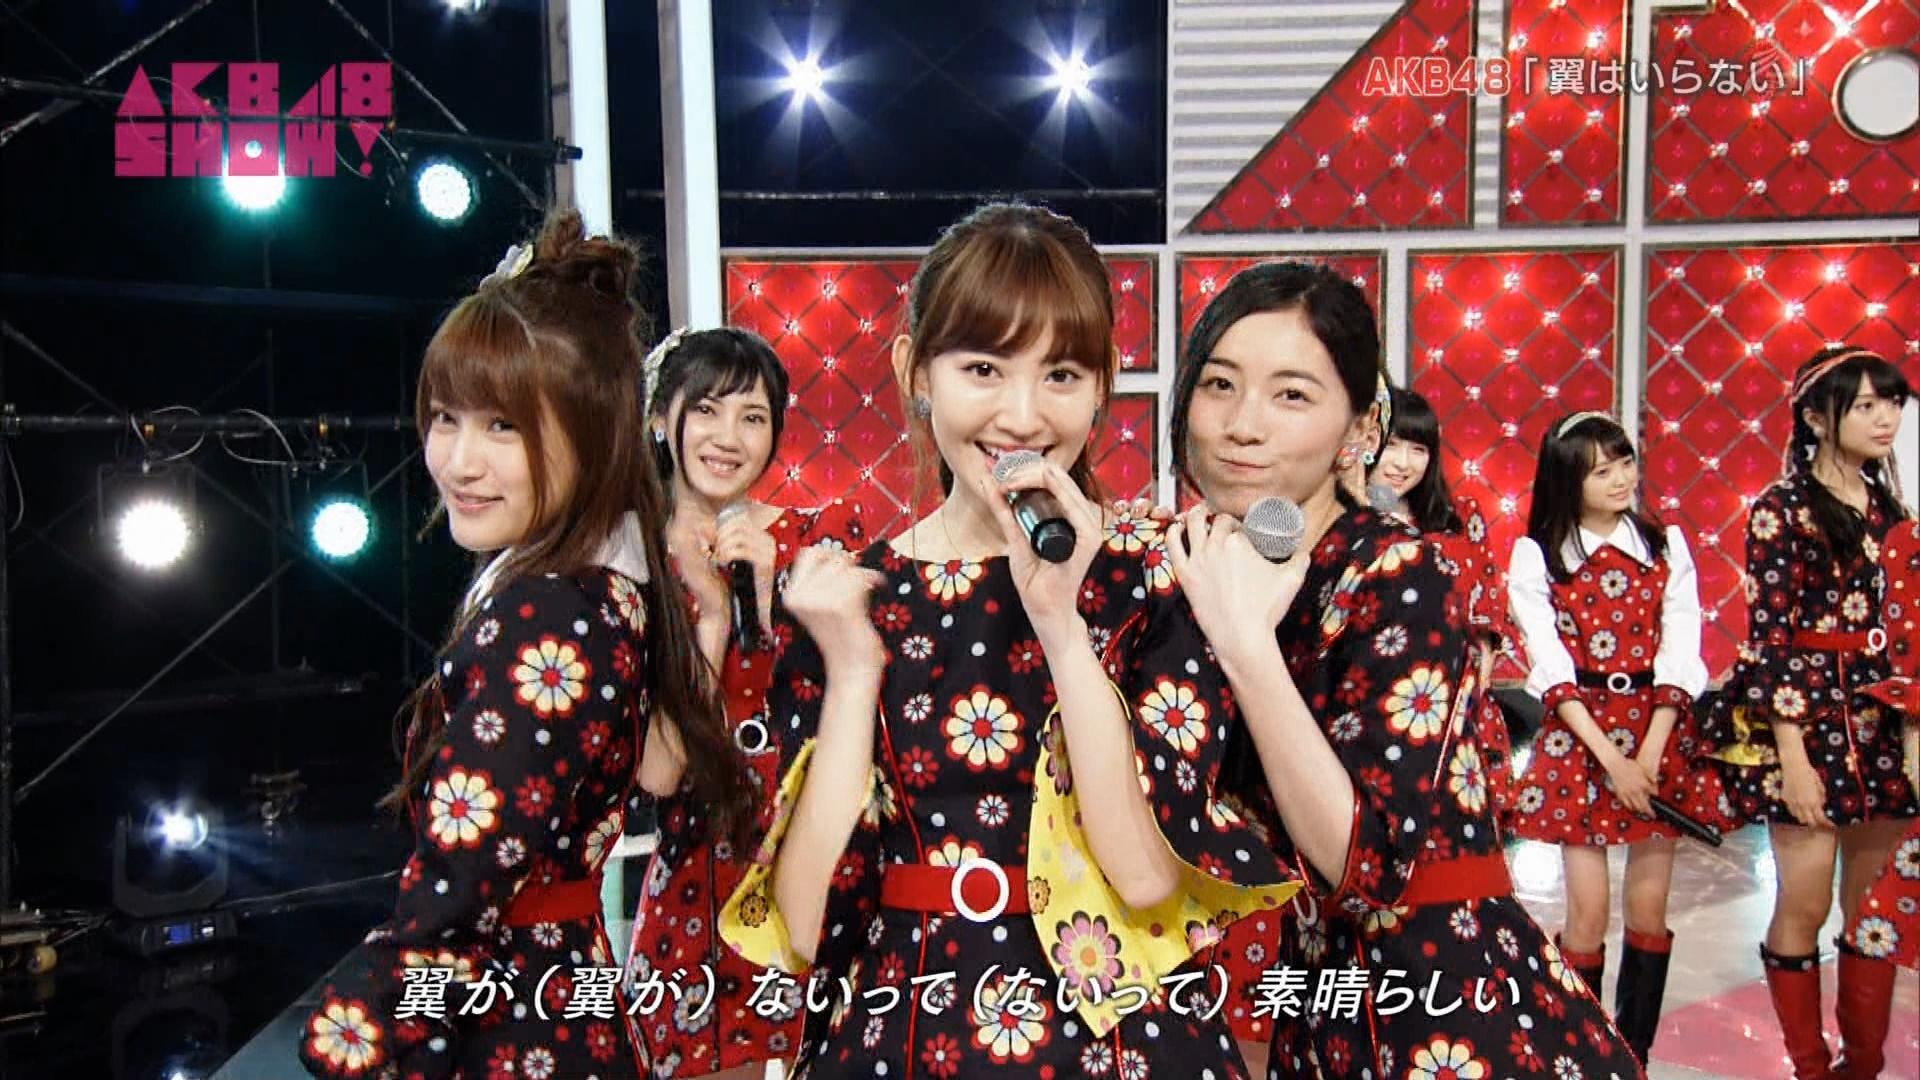 【SKE48/AKB48】北川綾巴☆応援スレ29【りょうちゃんズ】©2ch.netYouTube動画>45本 dailymotion>2本 ->画像>1542枚